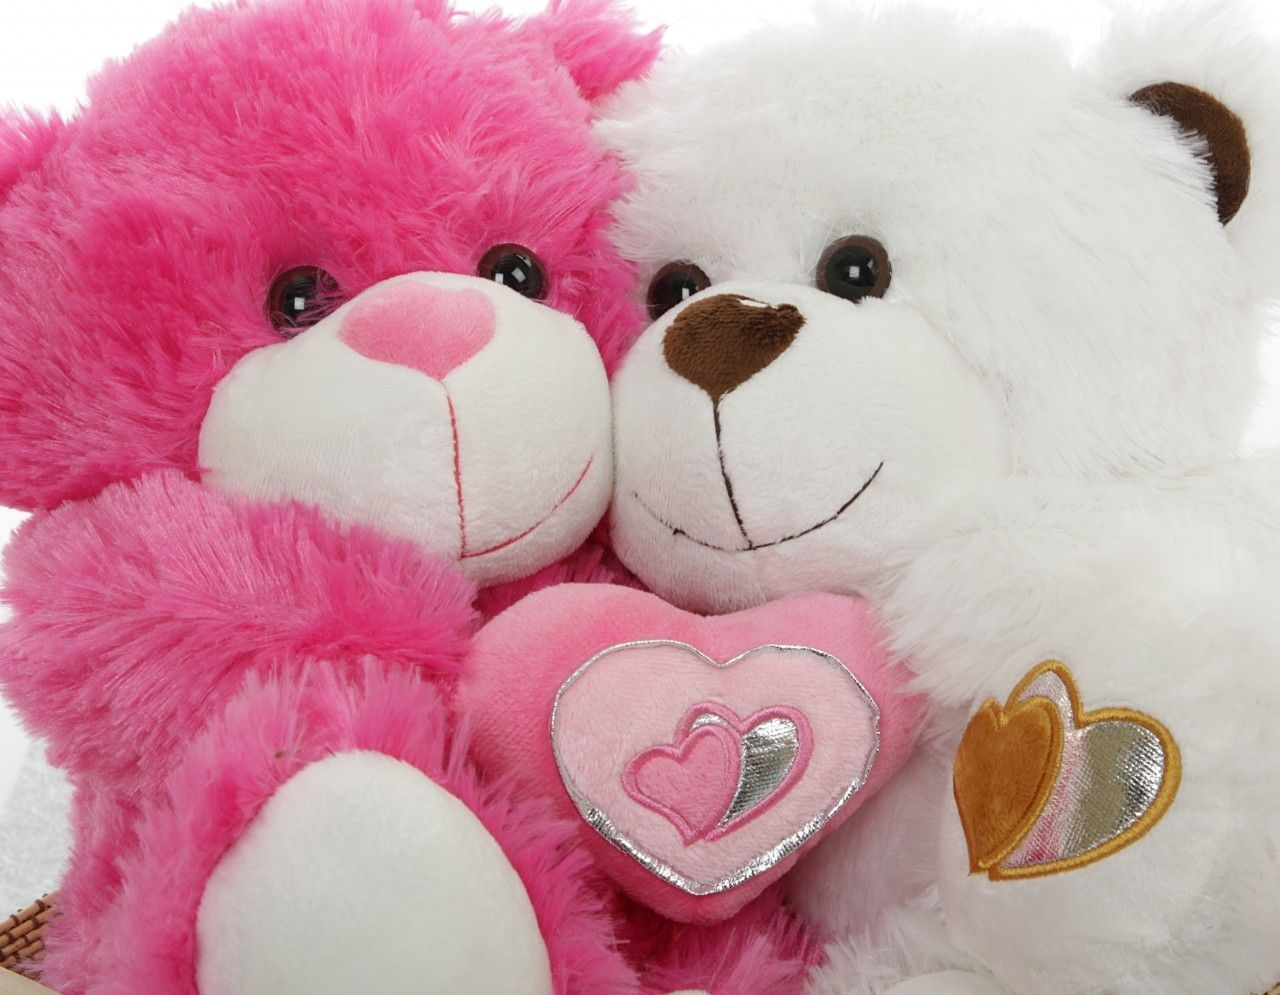 Popular Wallpaper Love Teddy Bear - 2d3e296153b0985650c7fa2d9208e77f  Pictures_75633.jpg